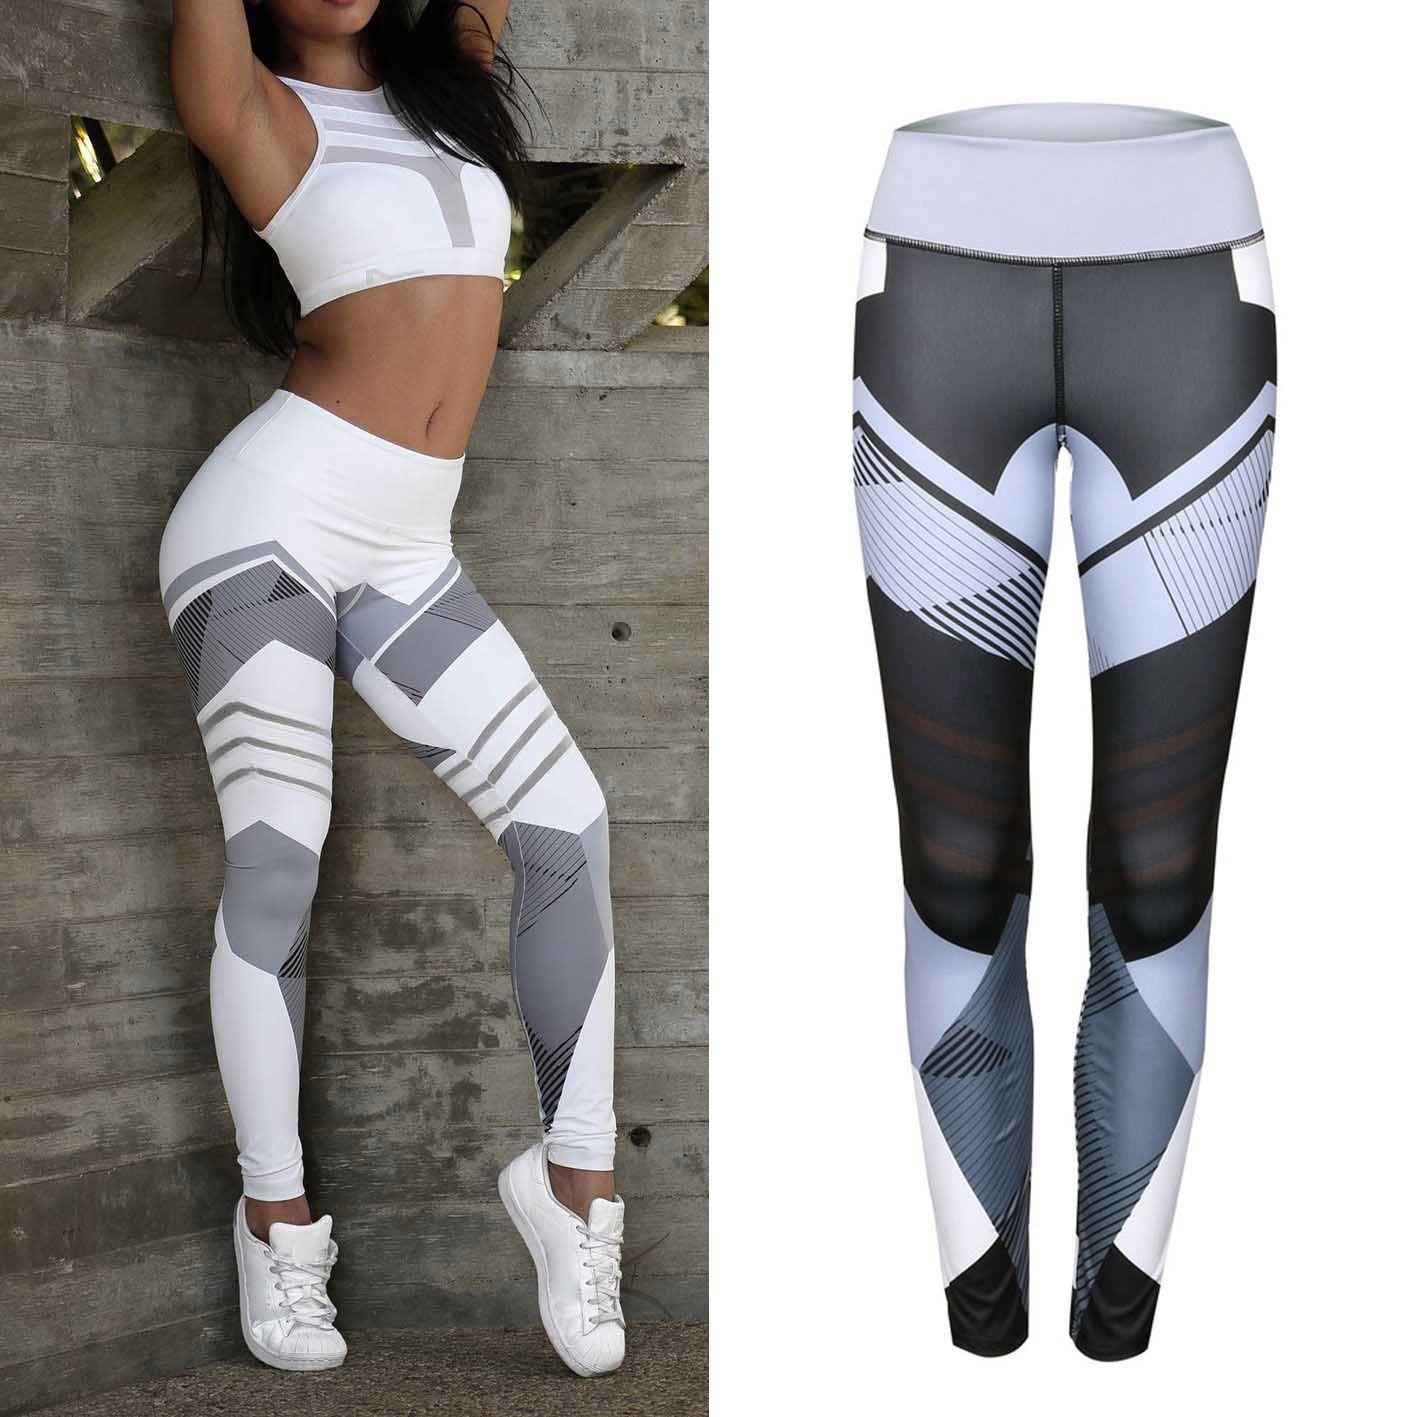 Sportswear Sport Leggins Yoga Fitness Running Gym Workout Femmes Motif Géométrique Collants Respirant Sexy Athletic Pantalons Leggings 3ARj54L